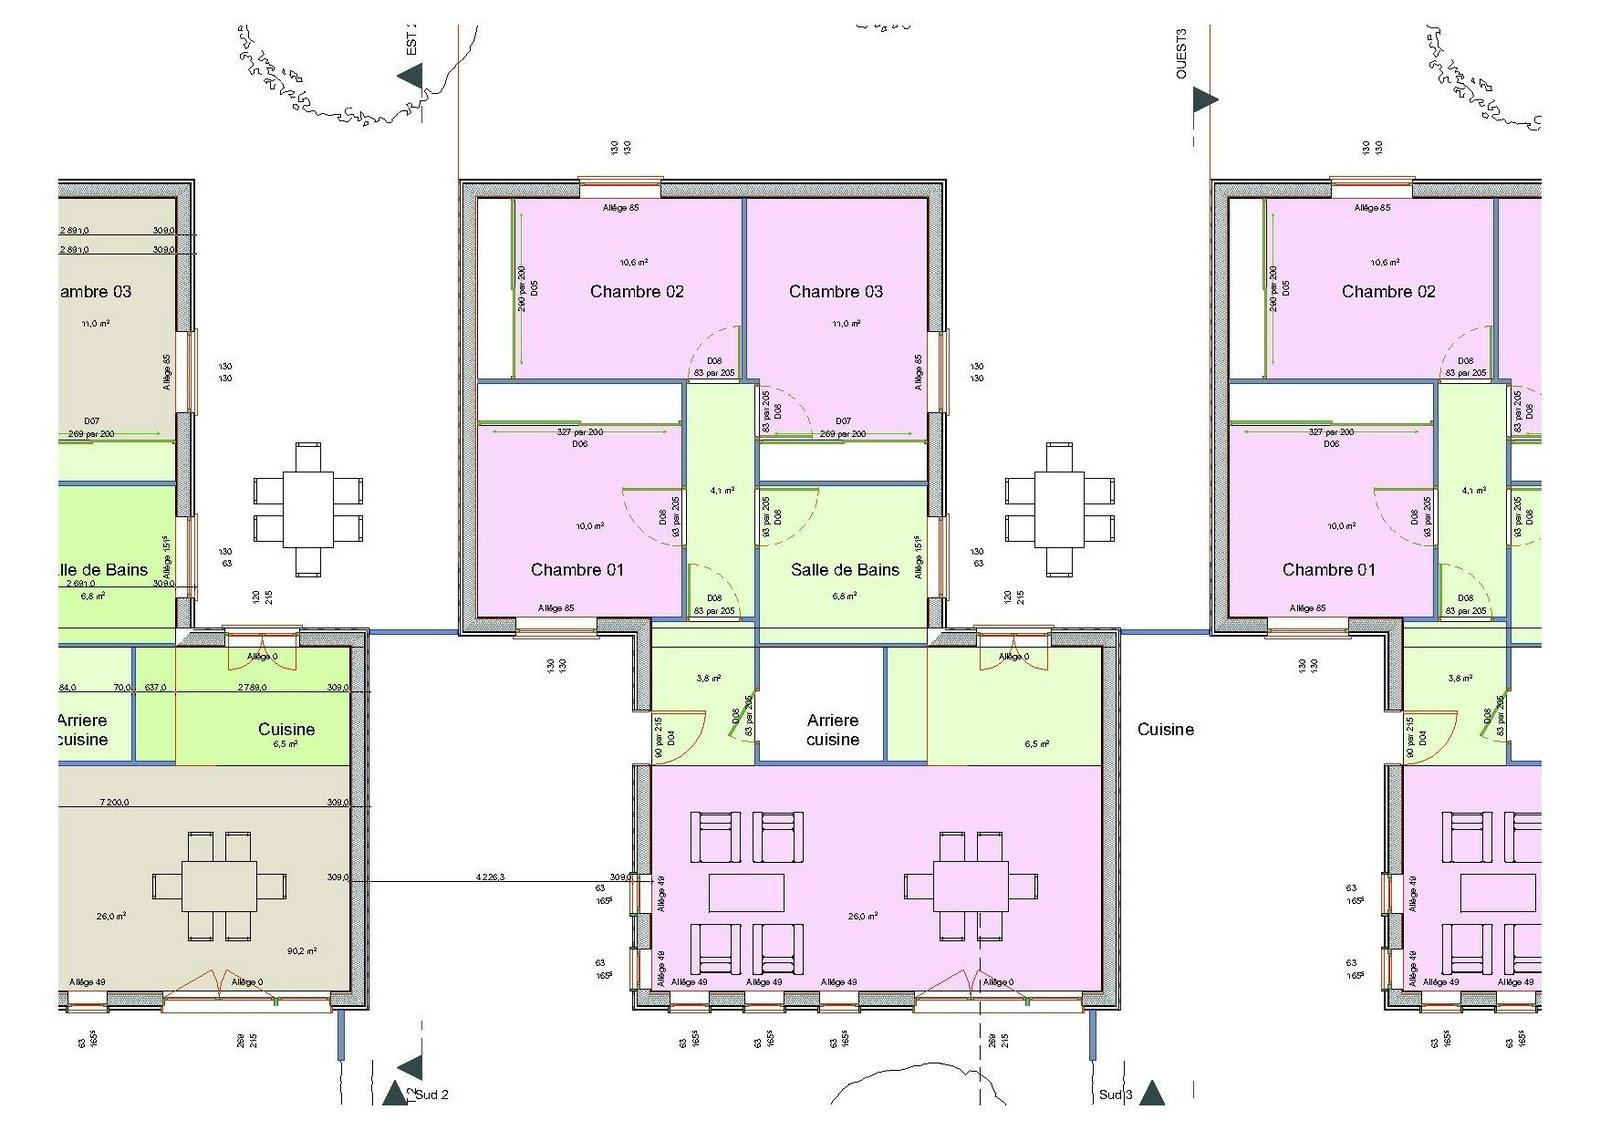 osez l 39 auto eco construction collective et accompagn e. Black Bedroom Furniture Sets. Home Design Ideas